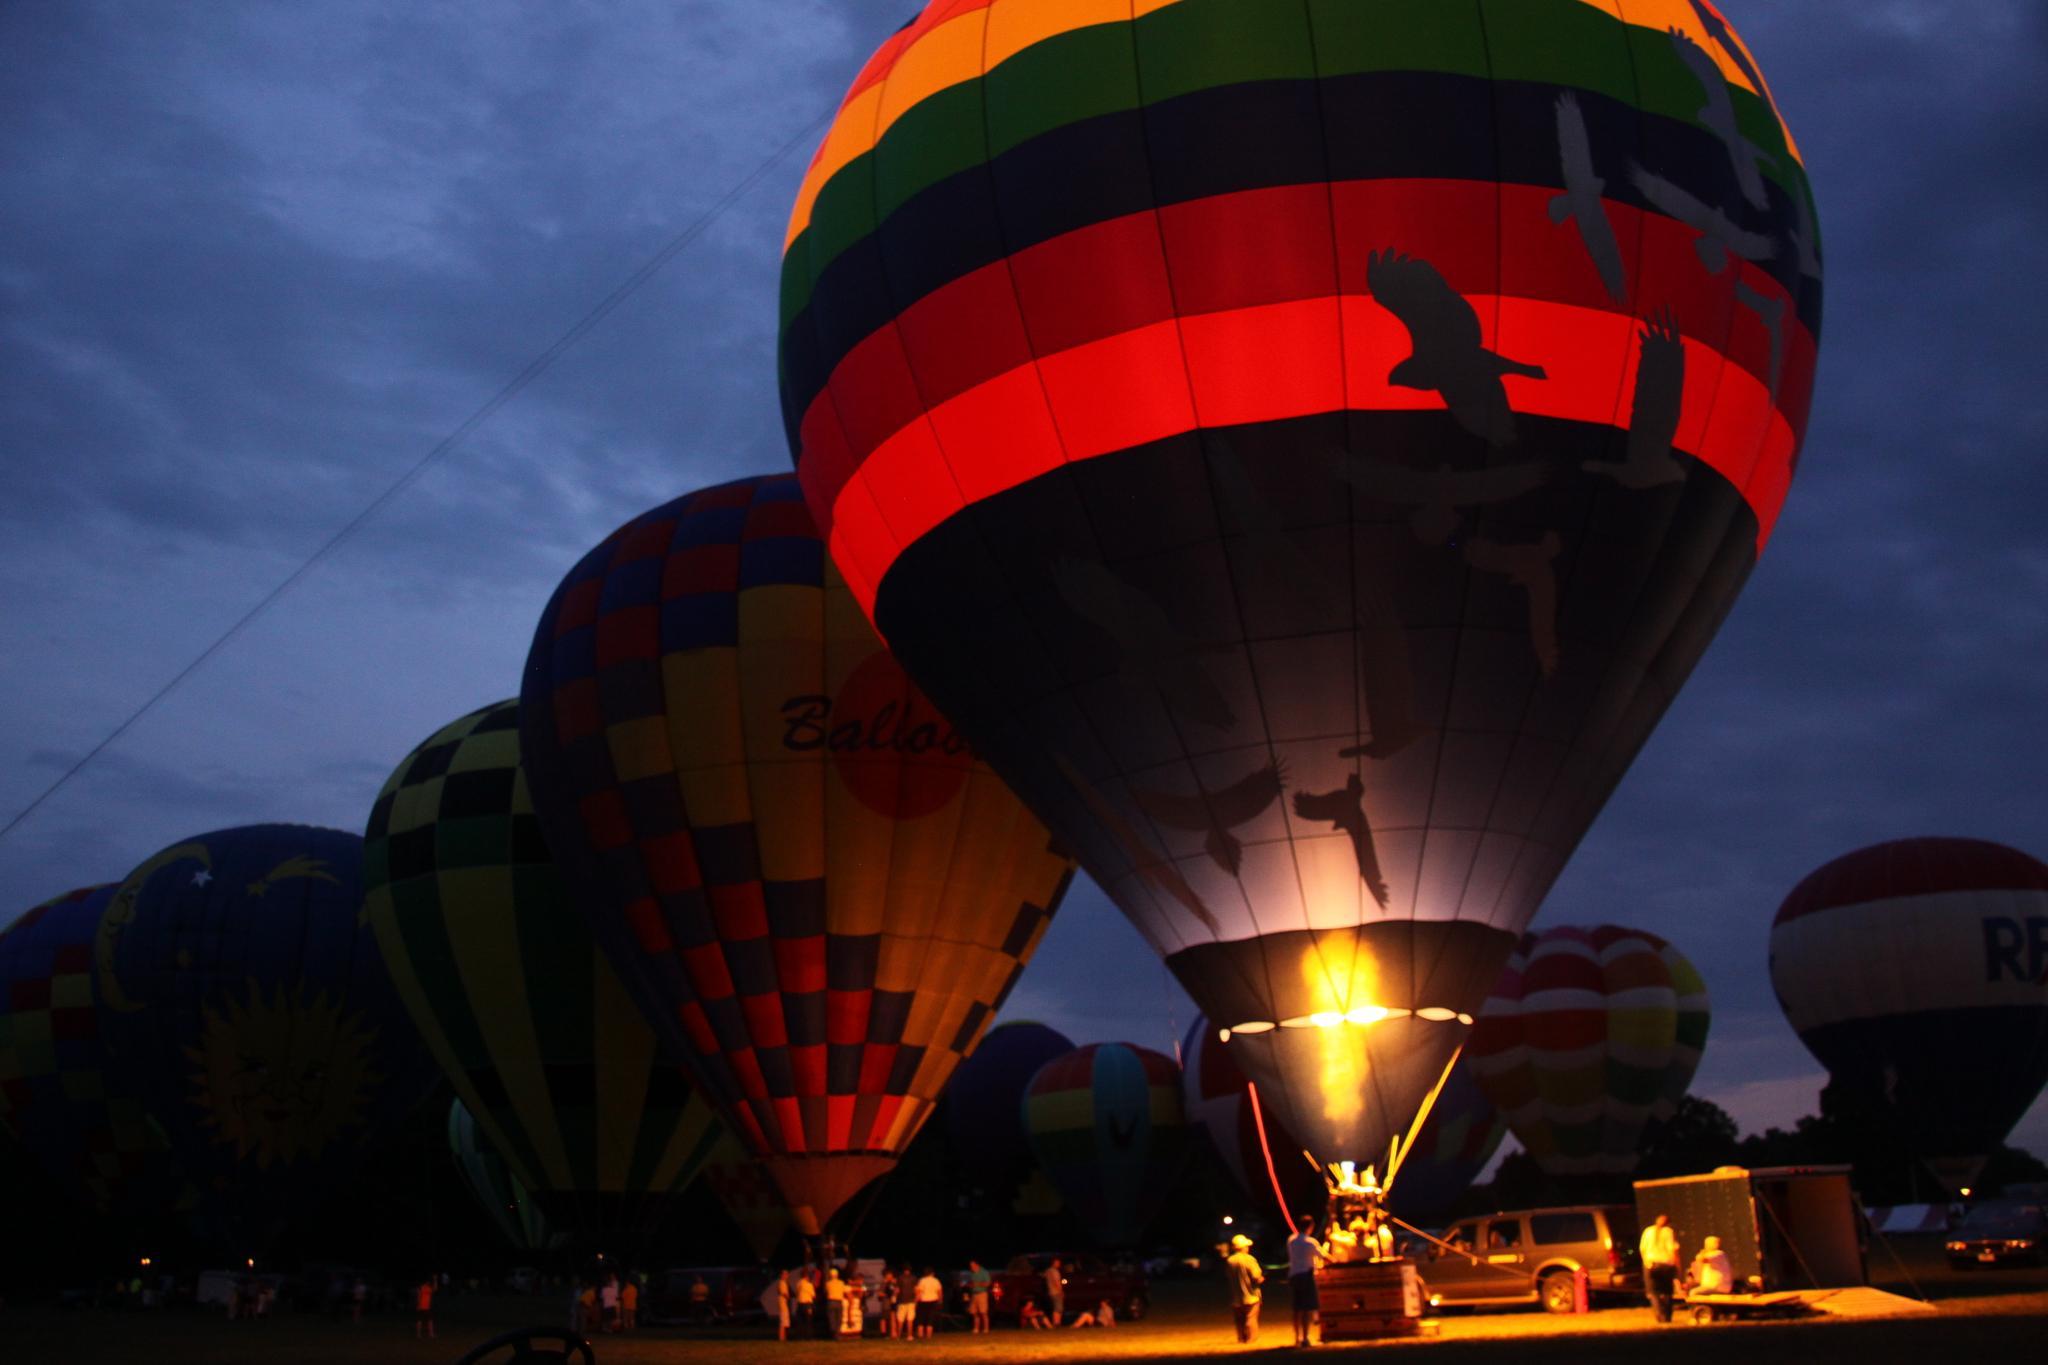 Balloon Glow at Dusk by Ryan W. Niemiec